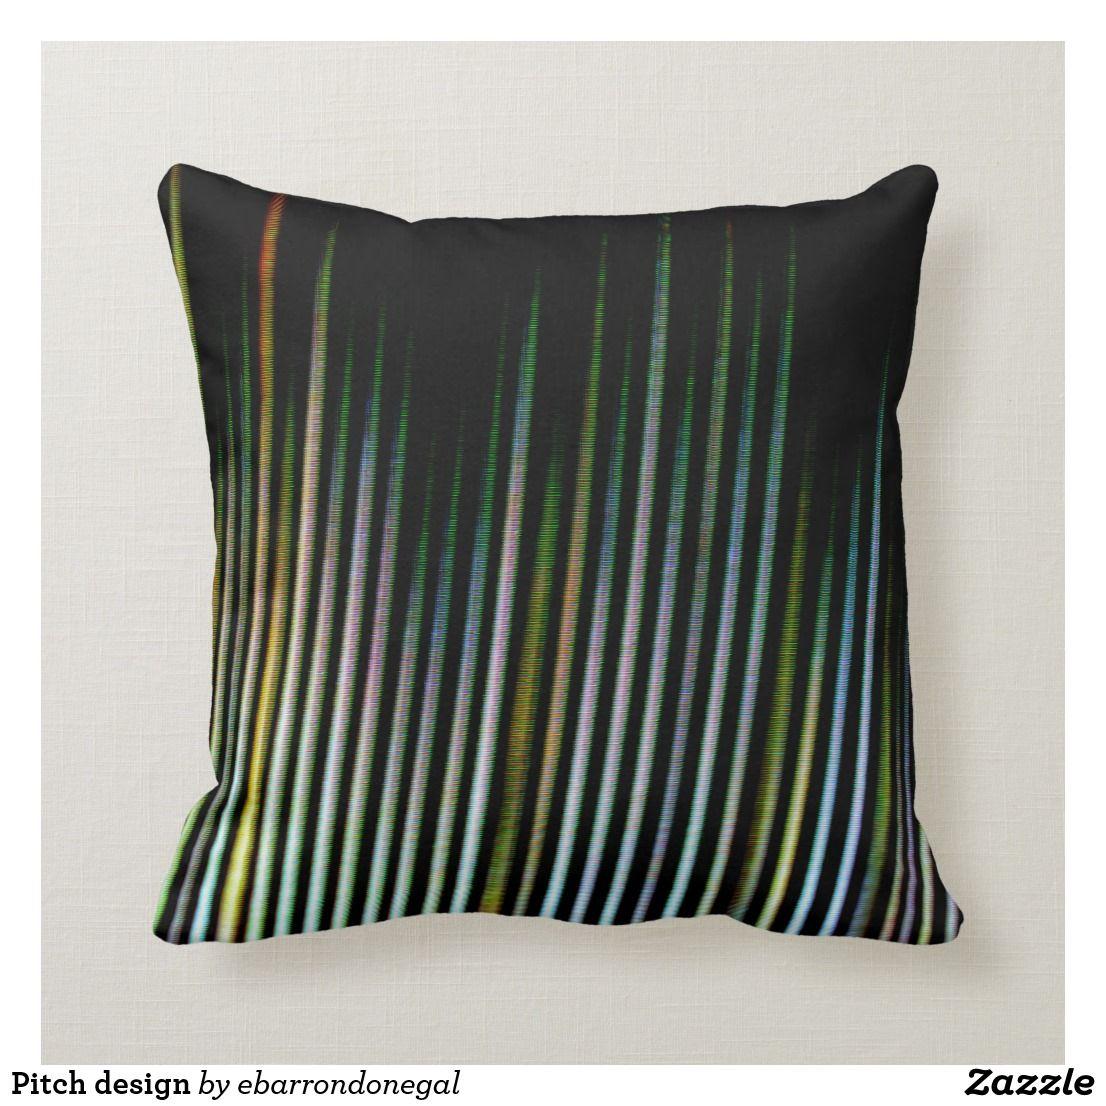 Pitch Design Throw Pillow Zazzle Com Throw Pillows Designer Throws Pillows